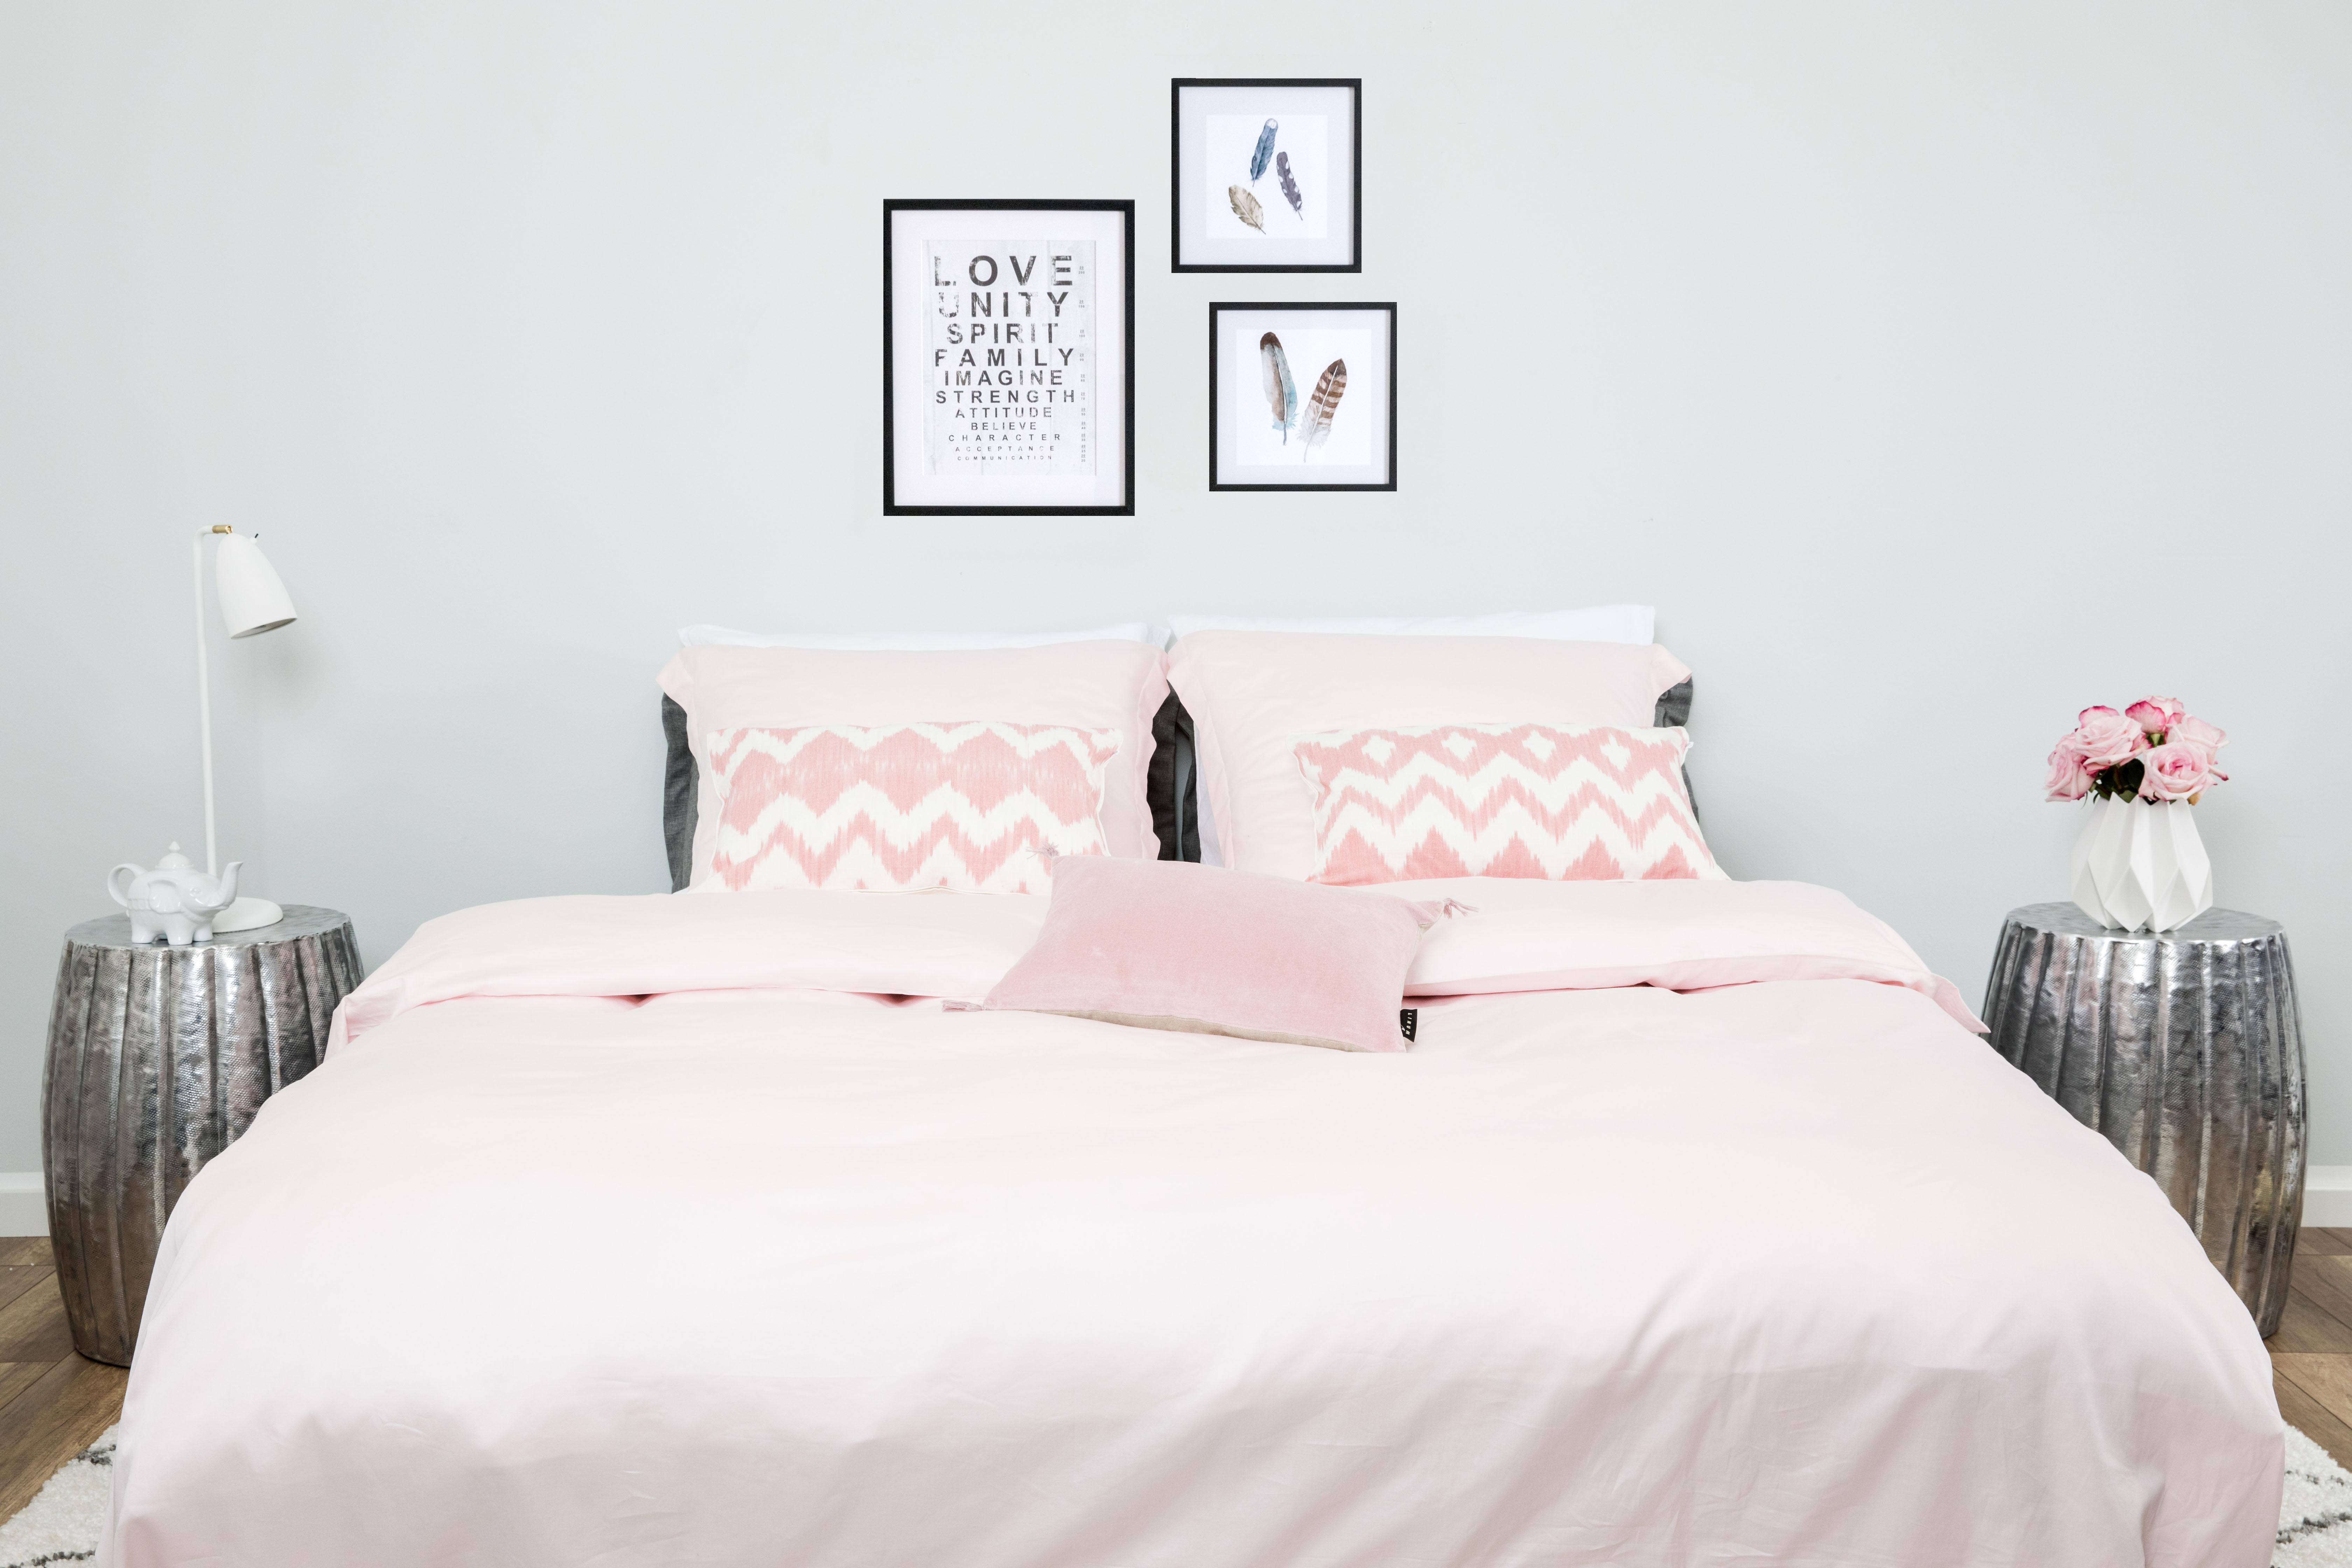 beddengoed-winter-percal-slaapkamer